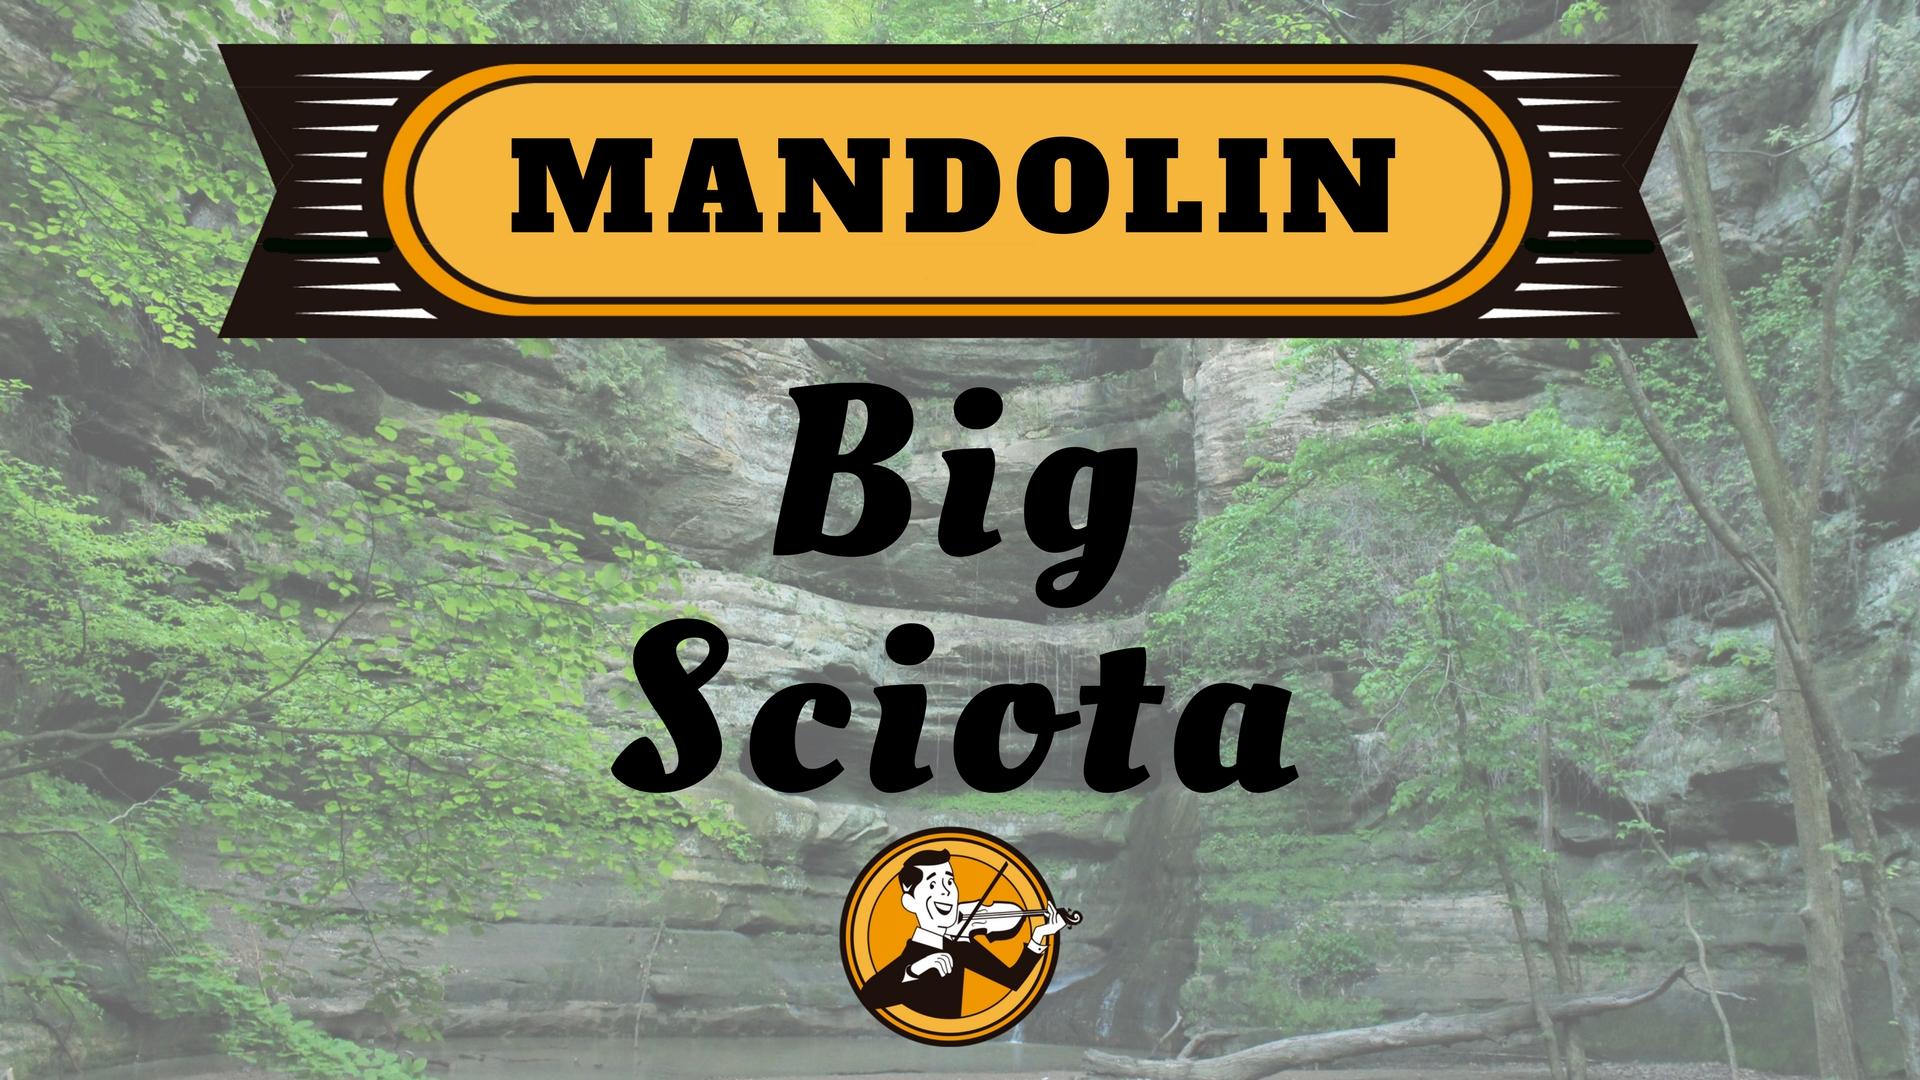 Mandolin Big Sciota